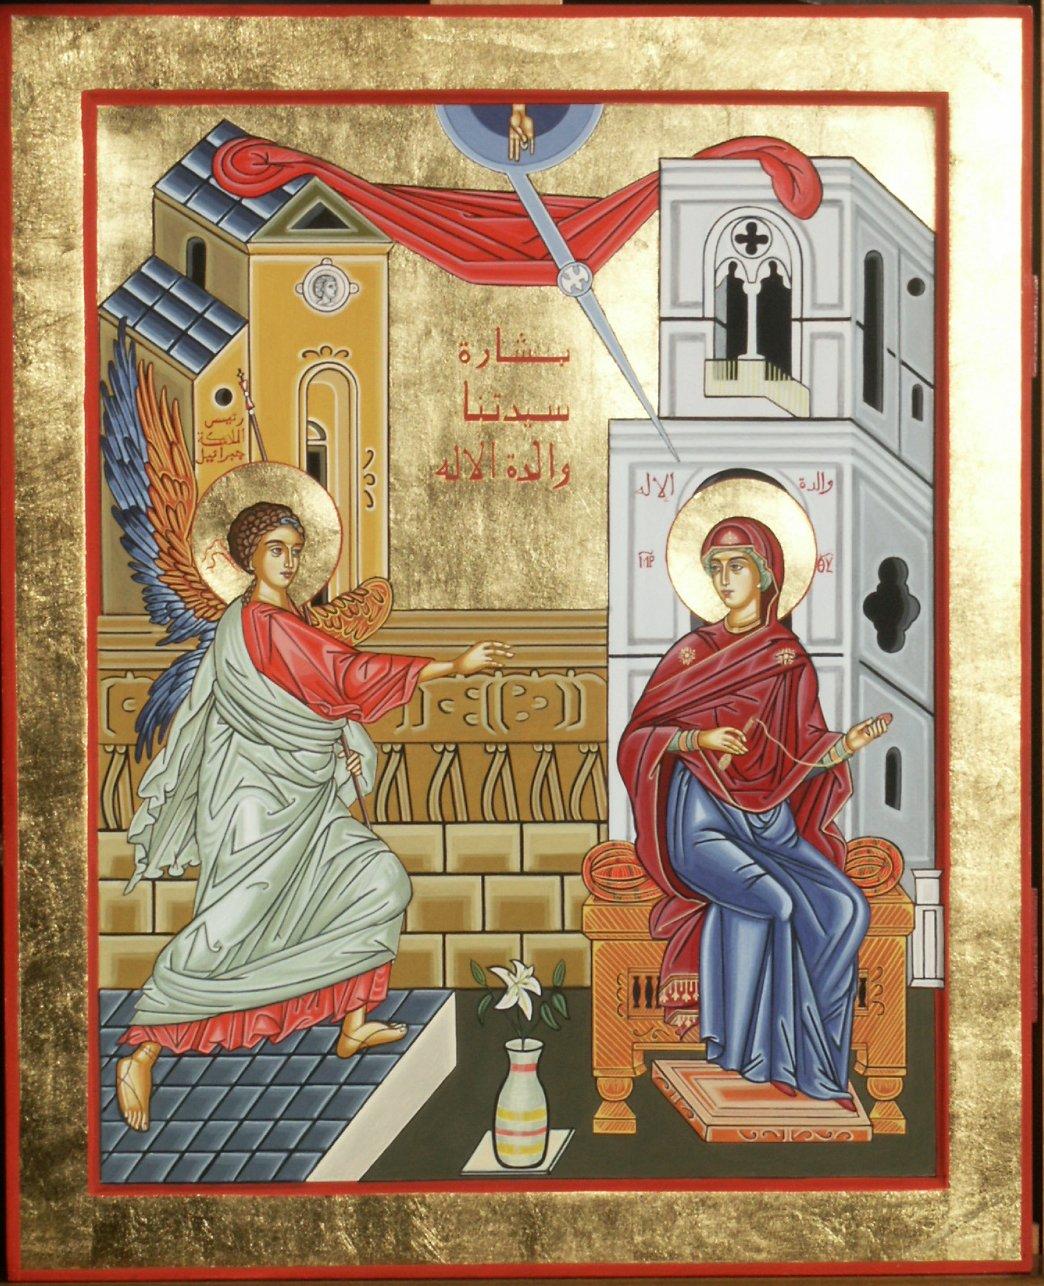 http://orthodoxesantiochenice.files.wordpress.com/2009/01/annonciation.jpg